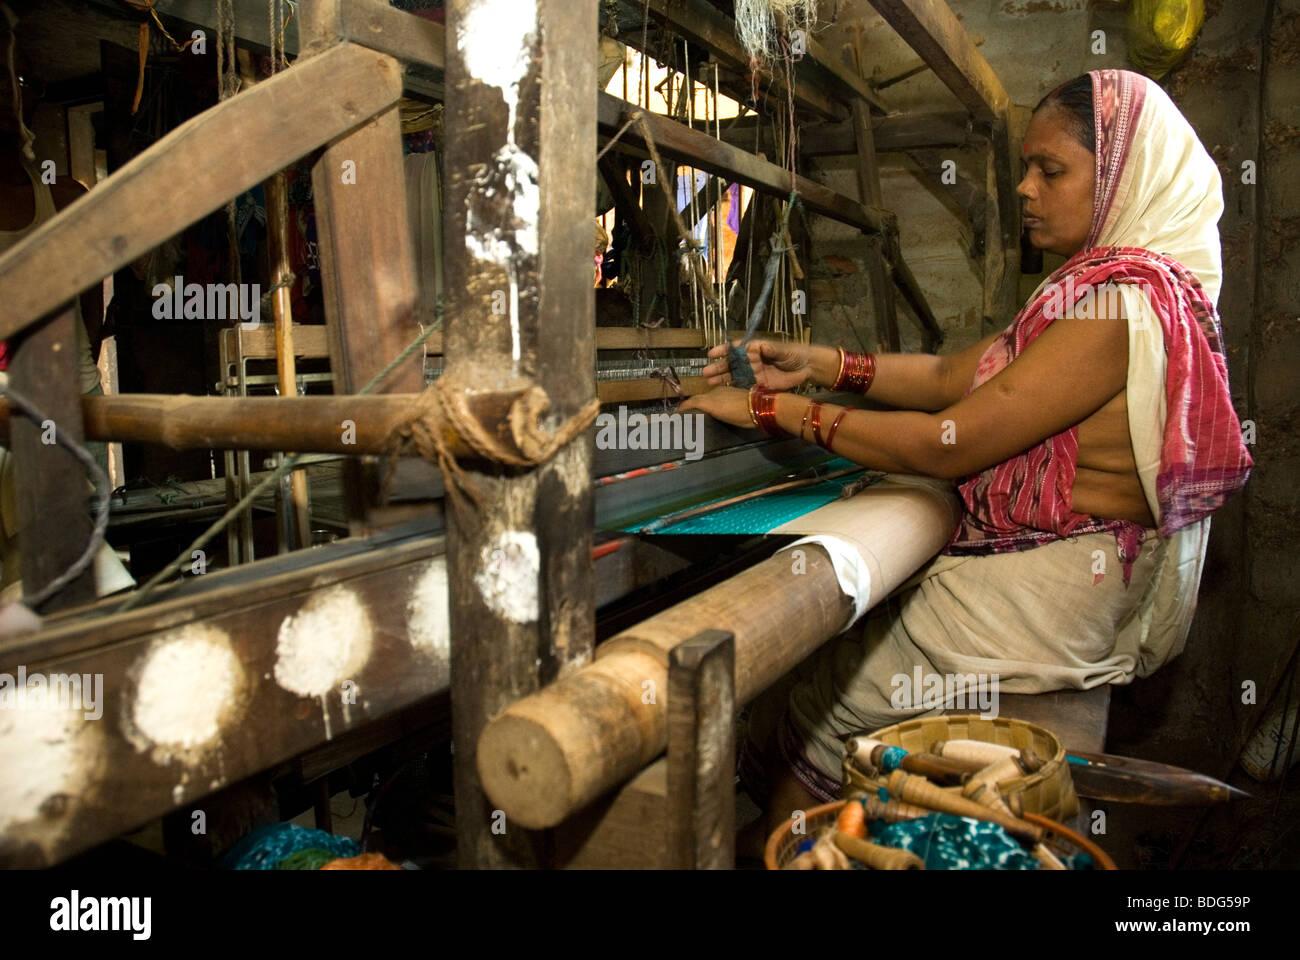 Woman working in her loom (Mme. Jhuman Das), Gopalpur, Orissa, India. - Stock Image